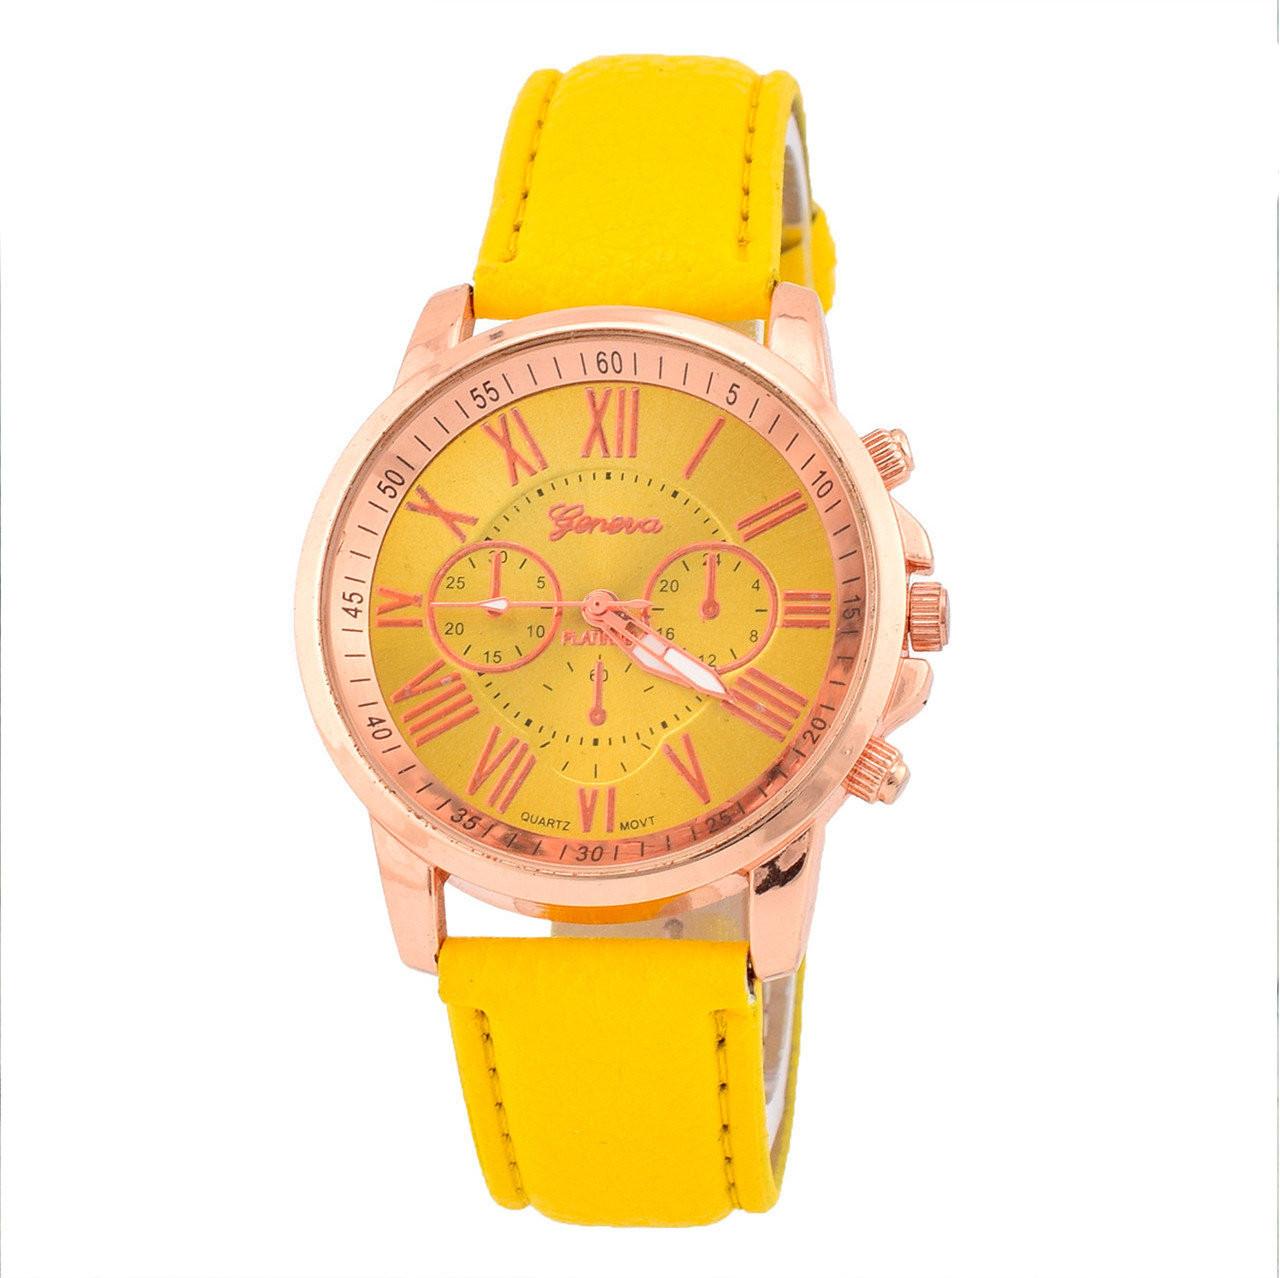 Часы G-012 диаметр циферблата 4 см, длина ремешка 17-21 см, ярко-желтый цвет, позолота РО